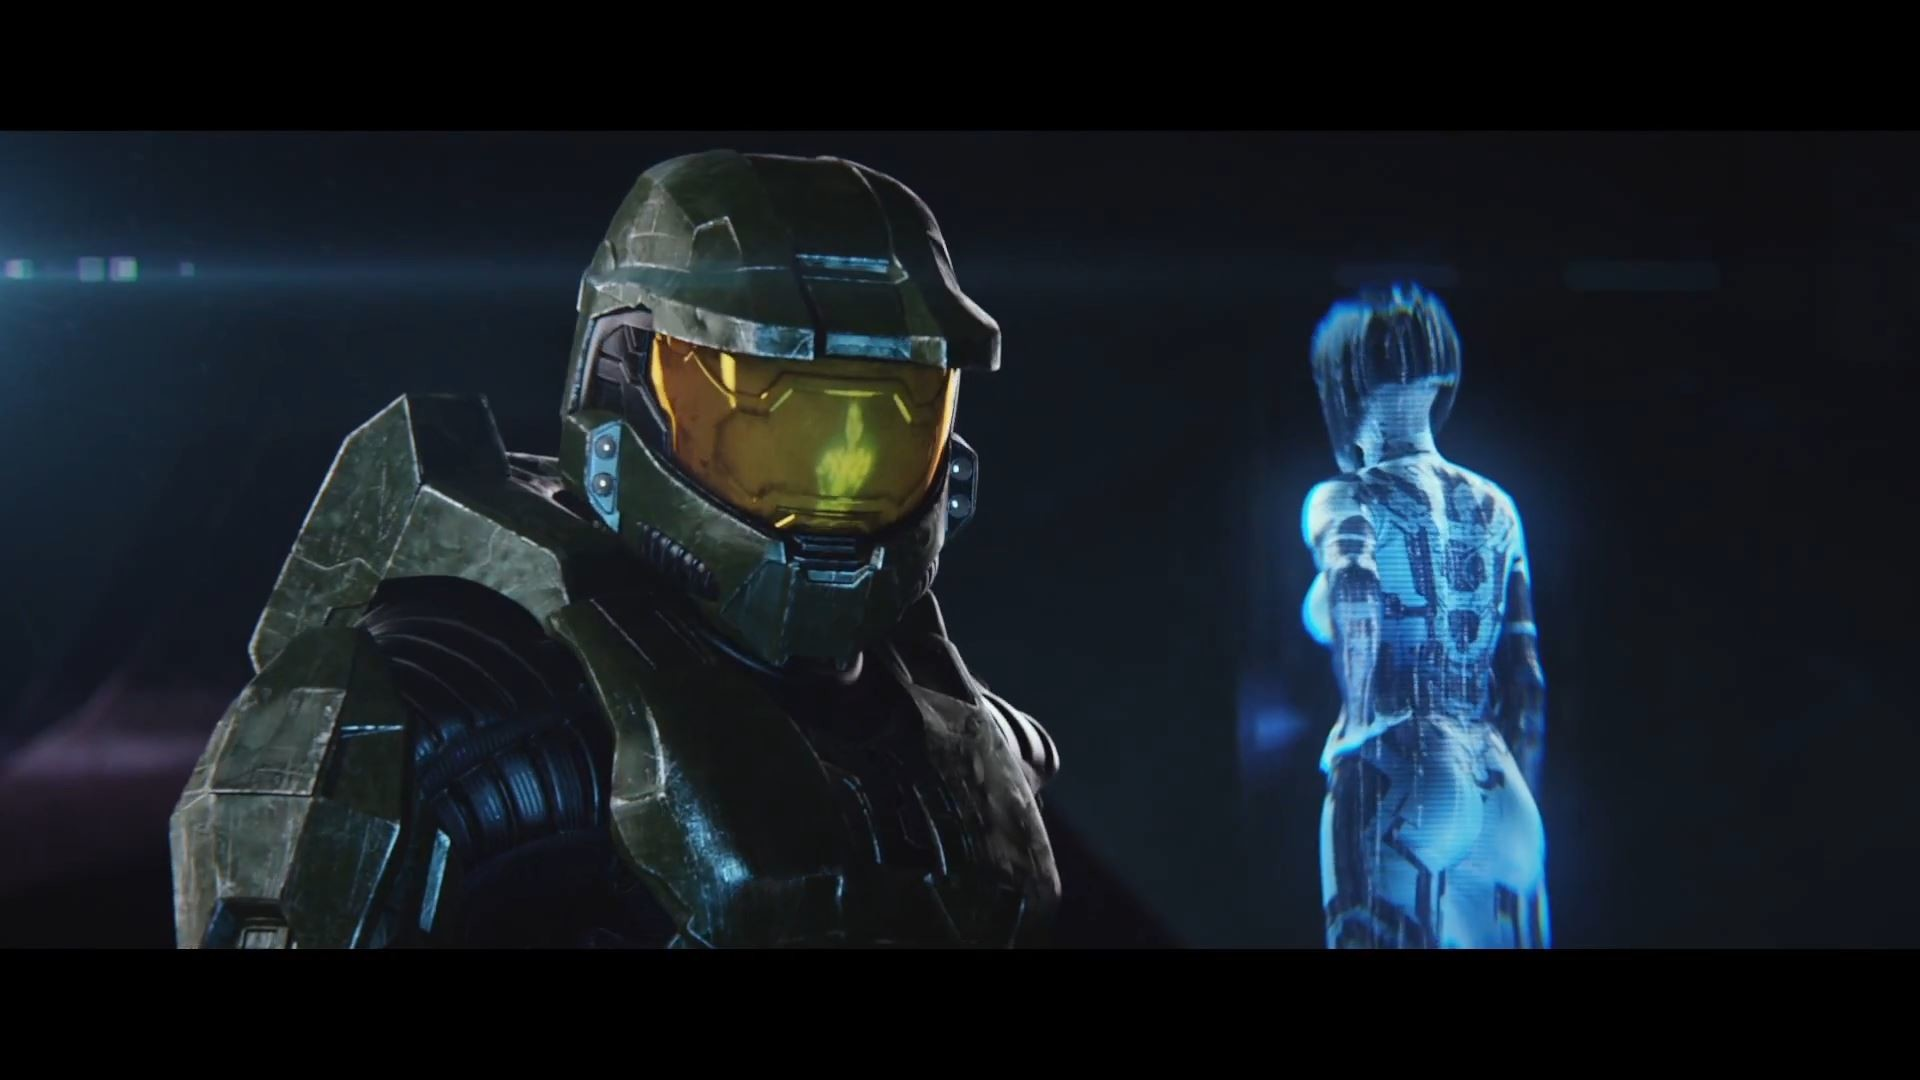 Halo 2 Anniversary Wallpaper Halo 2 Anniversary Wallpaper